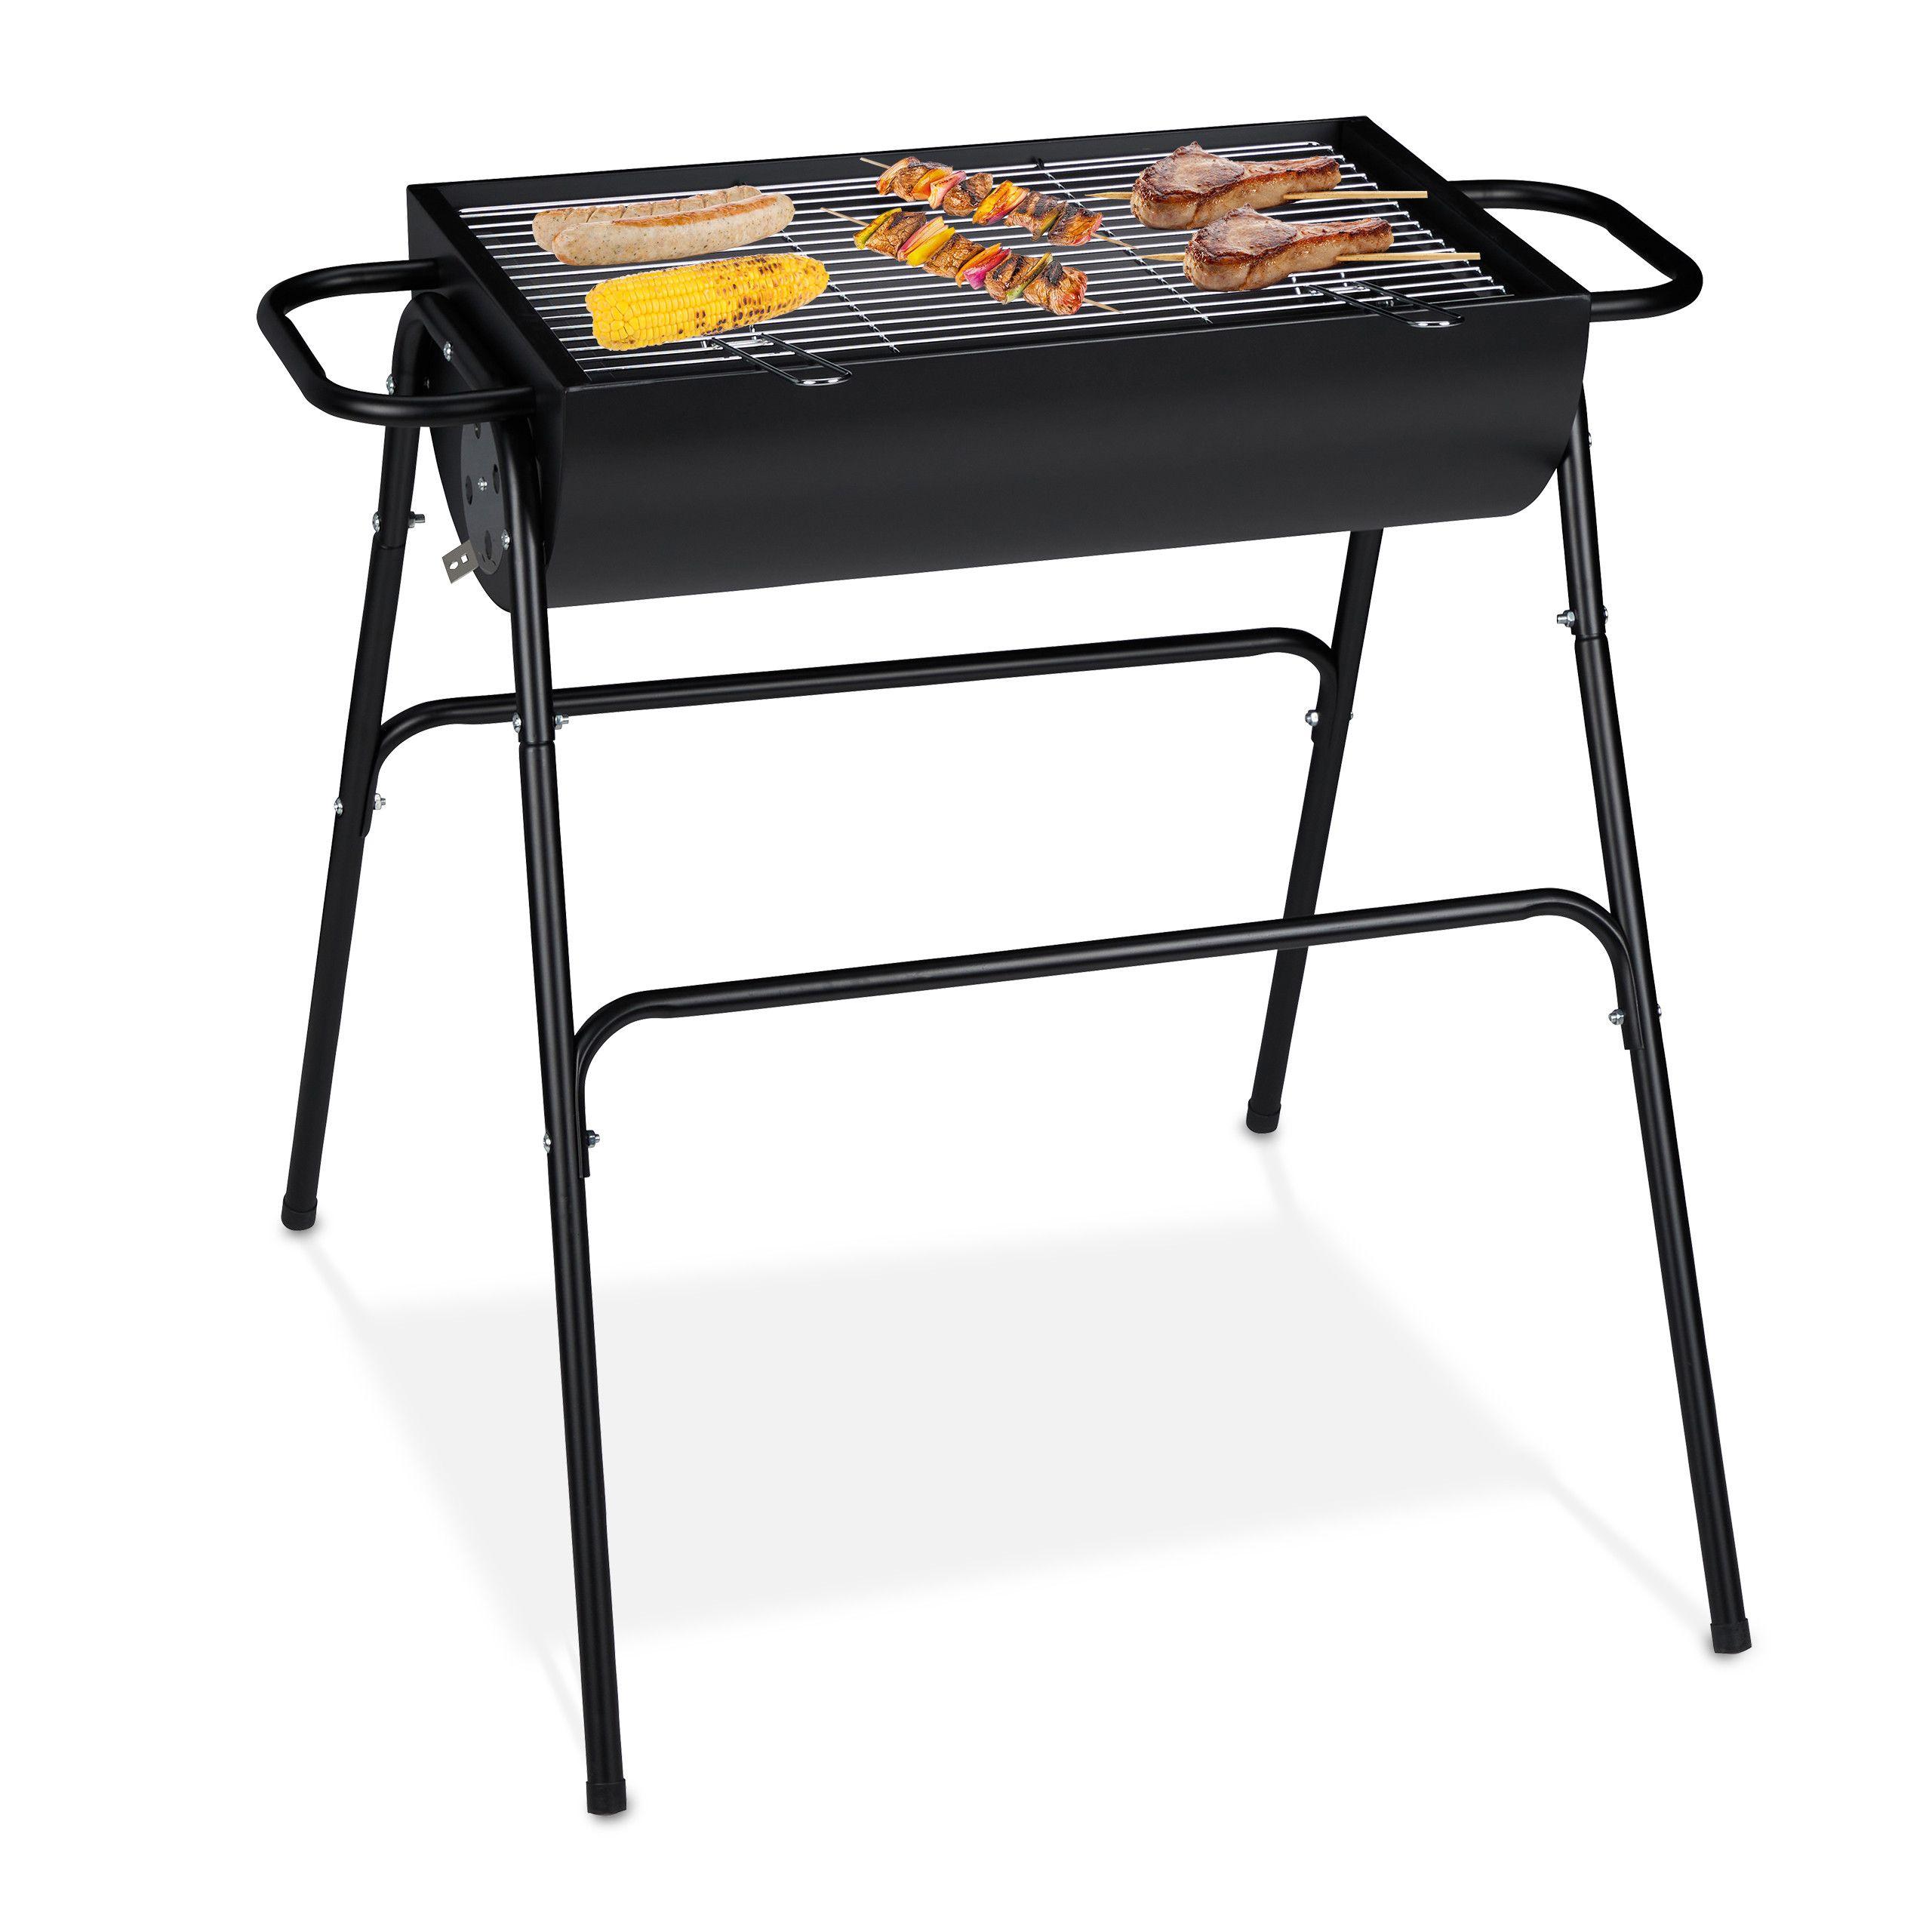 tragbar Kohlebeh/älter Relaxdays Grilleimer /Ø 26,5 cm schwarz Picknick Holzkohlegrill Balkon /& Camping mit Rost